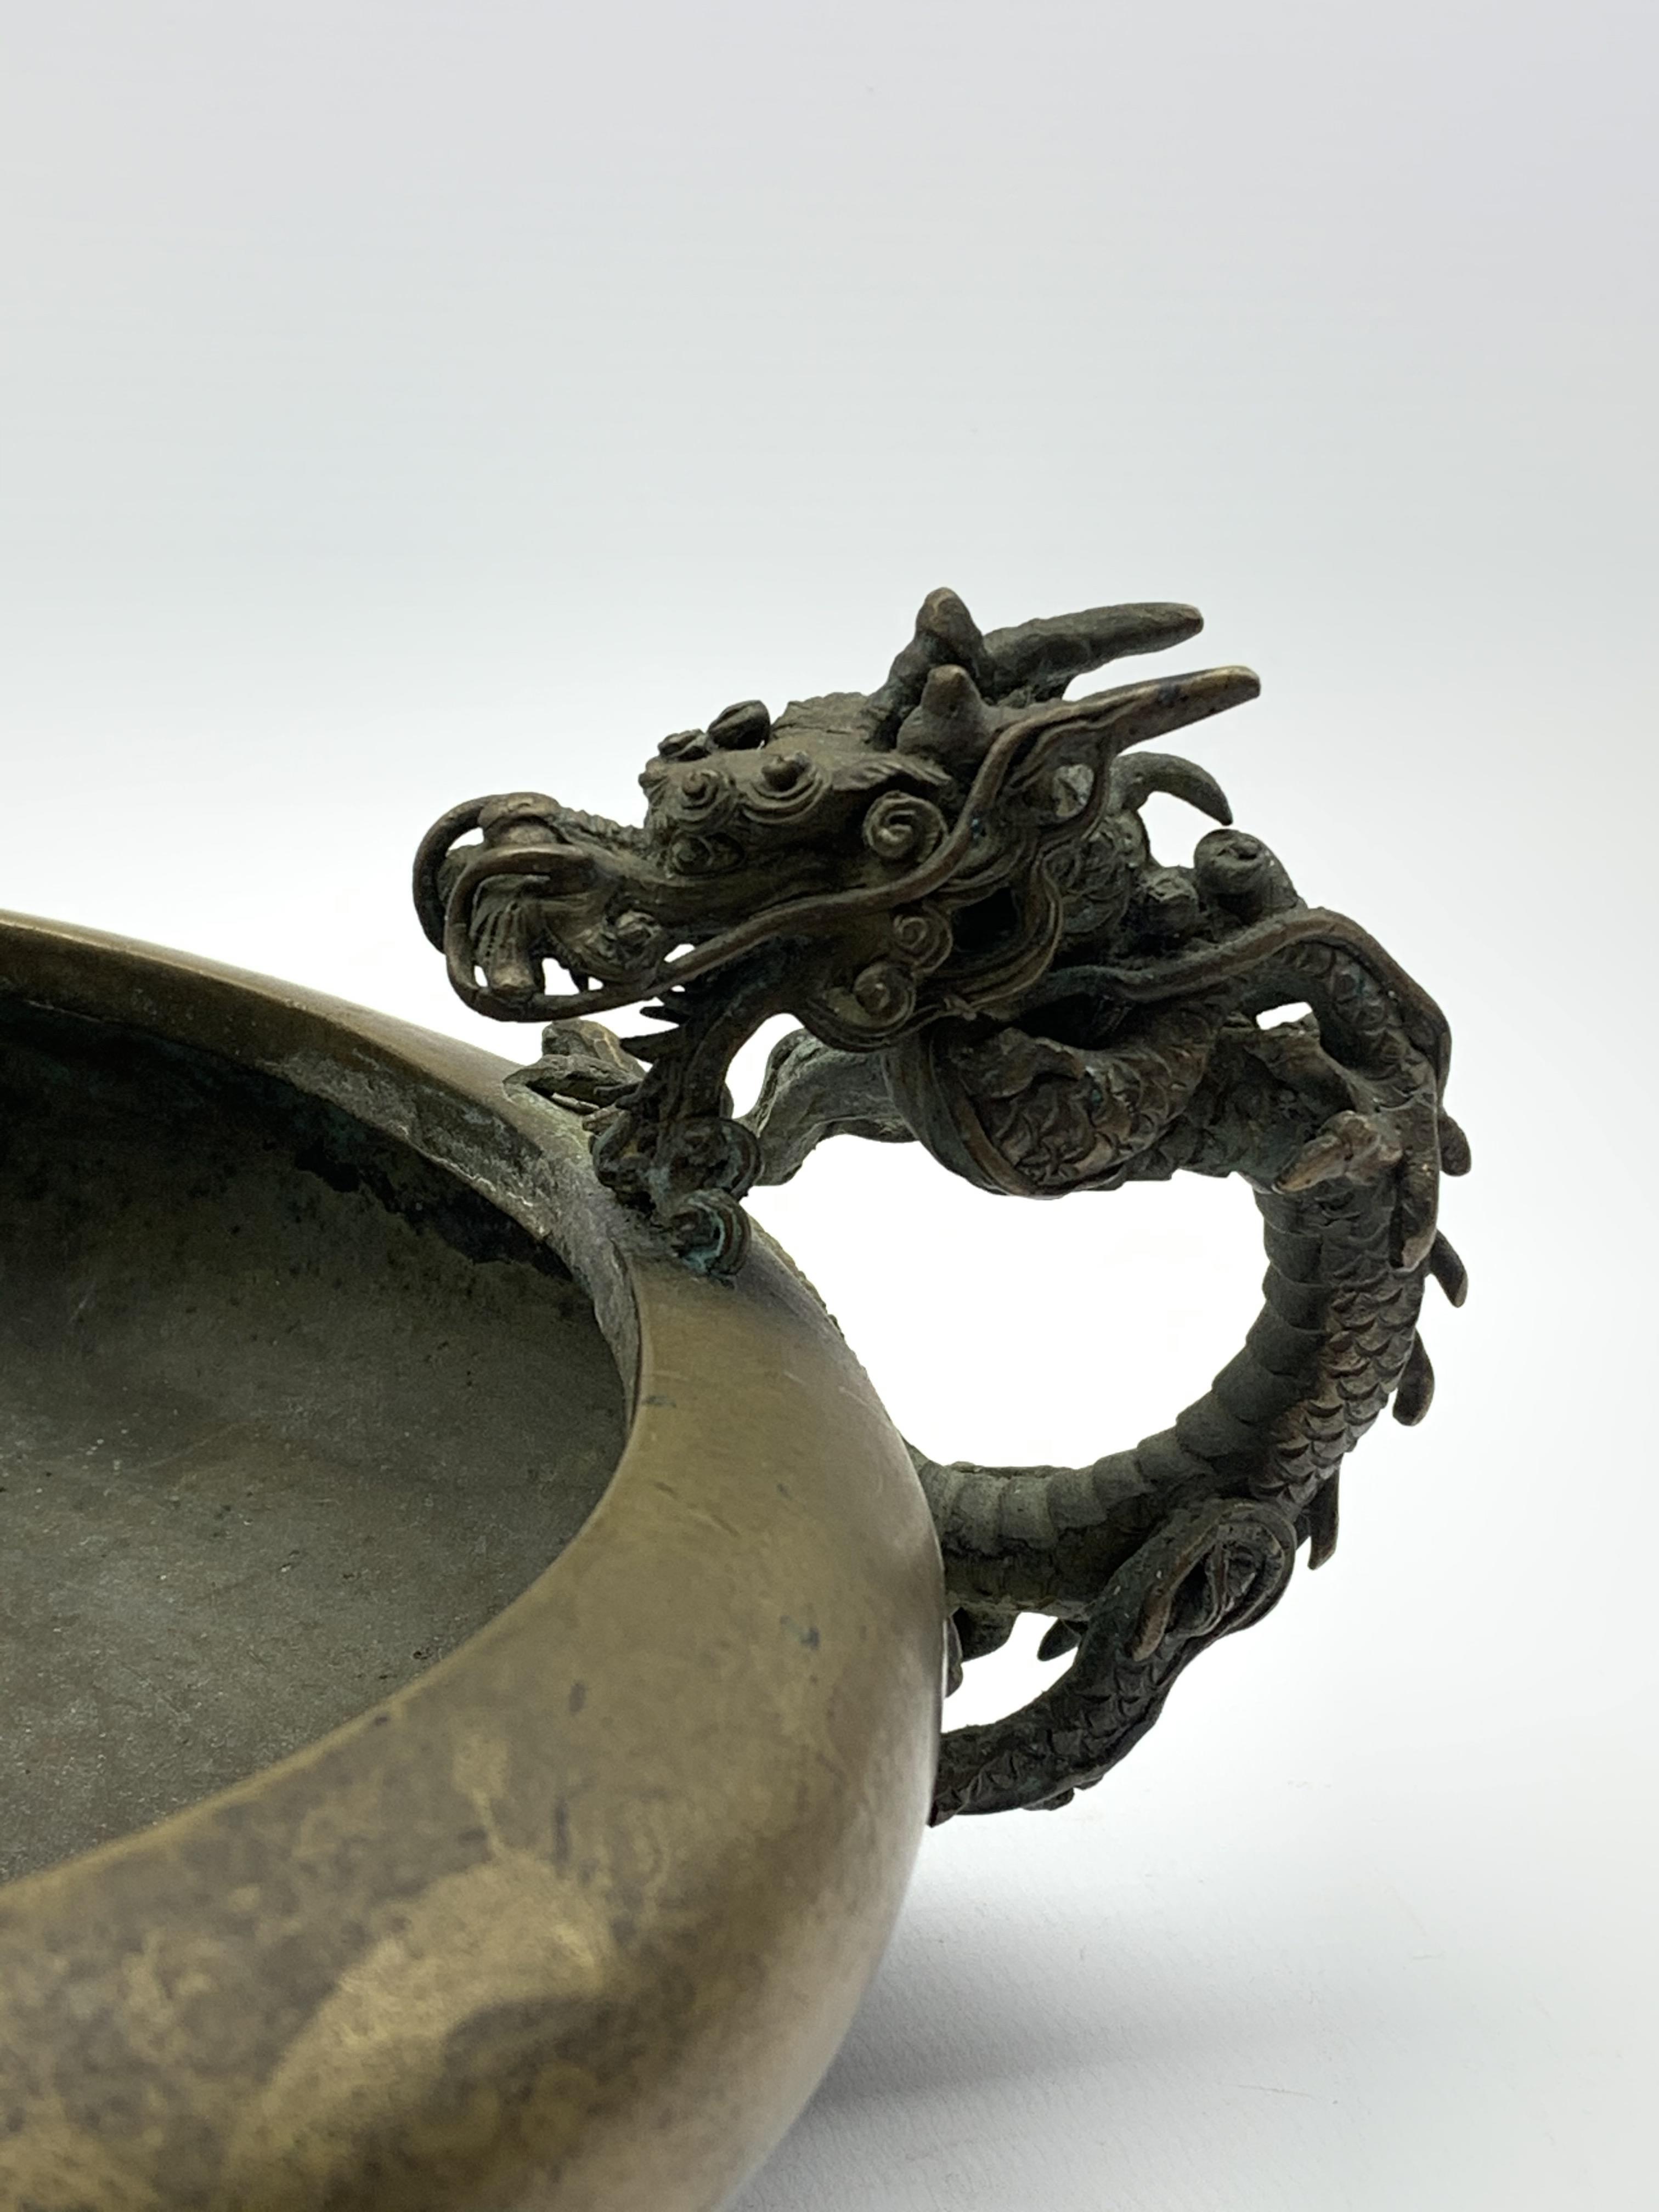 19th century Japanese bronze censer - Image 2 of 5